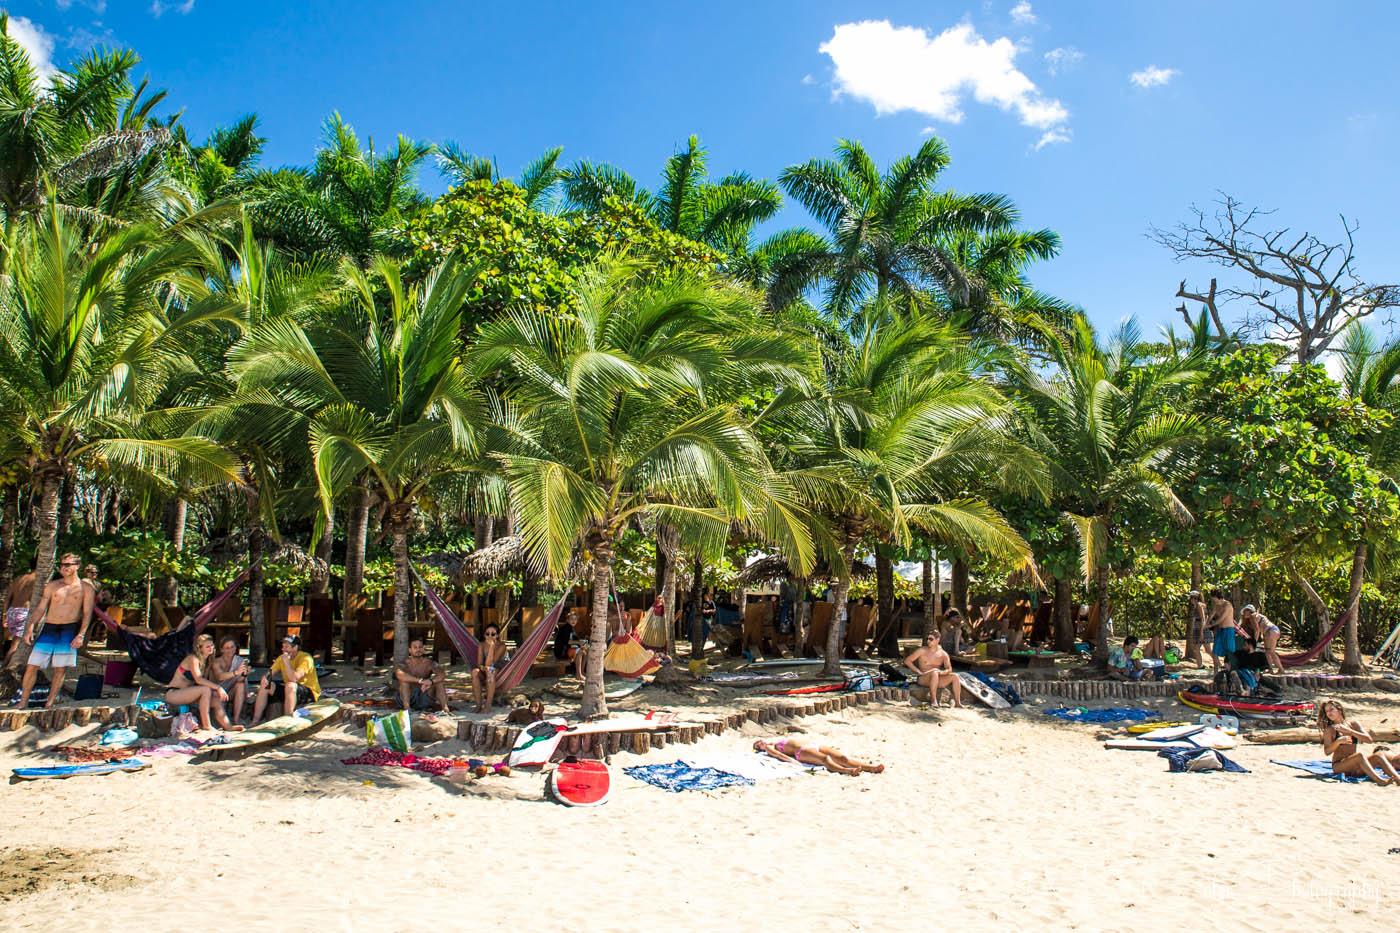 Playa Avellanas, Guanacaste. Costa Rica